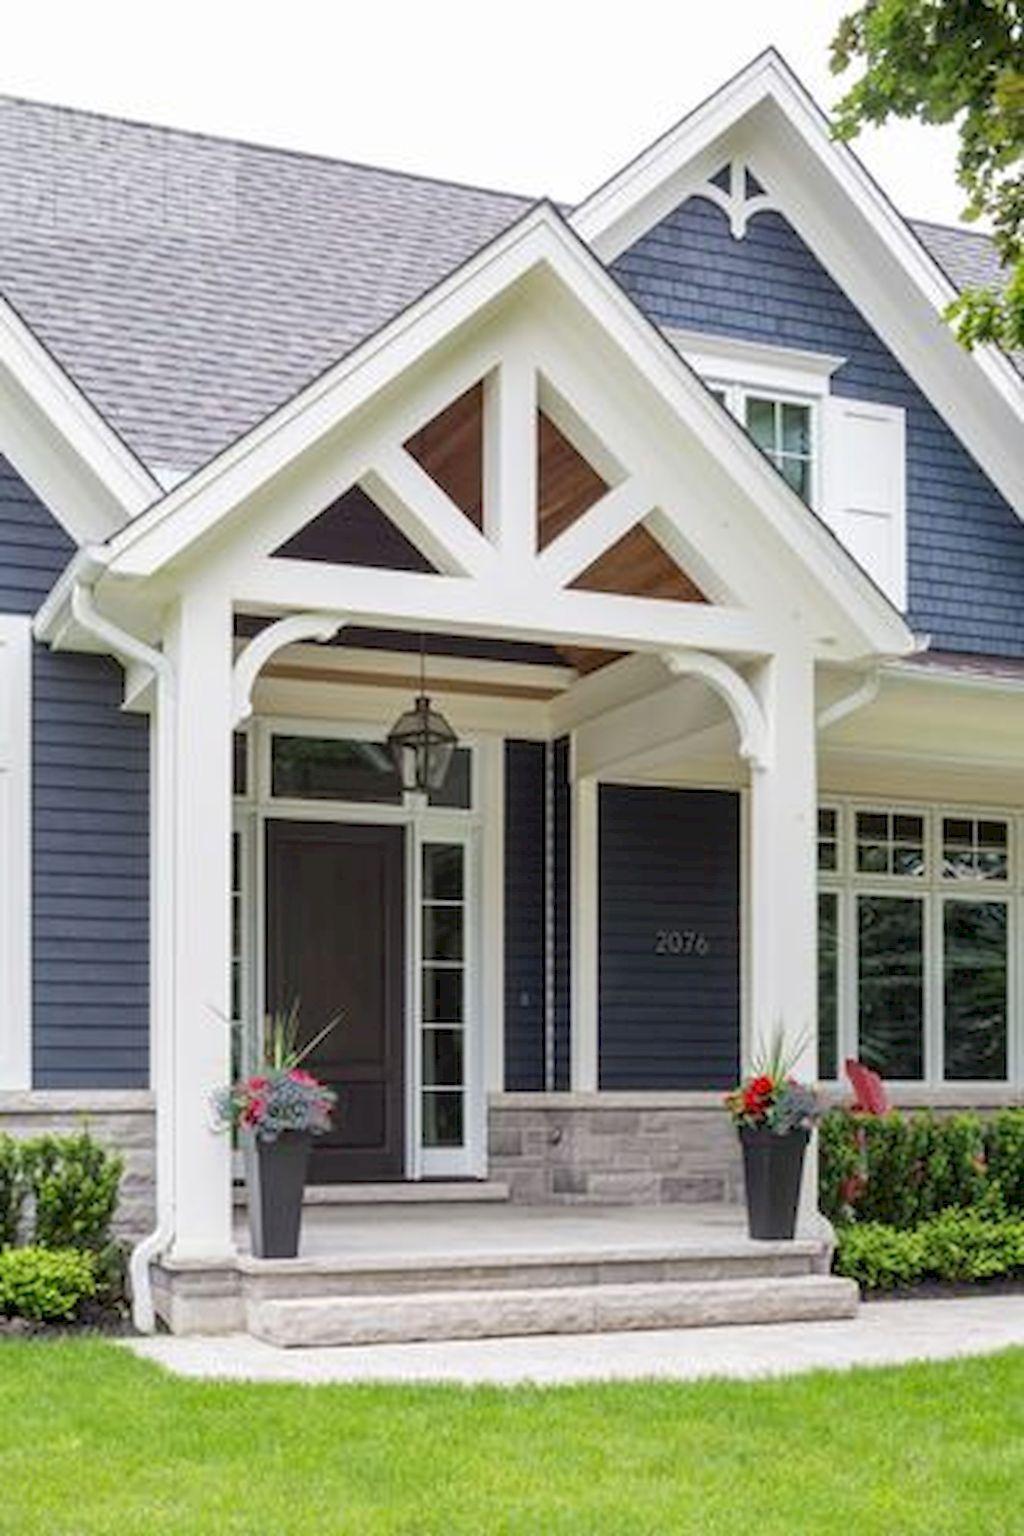 Exterior House Porch Ideas With Stone Columns 79 House With Porch Front Porch Design Porch Design